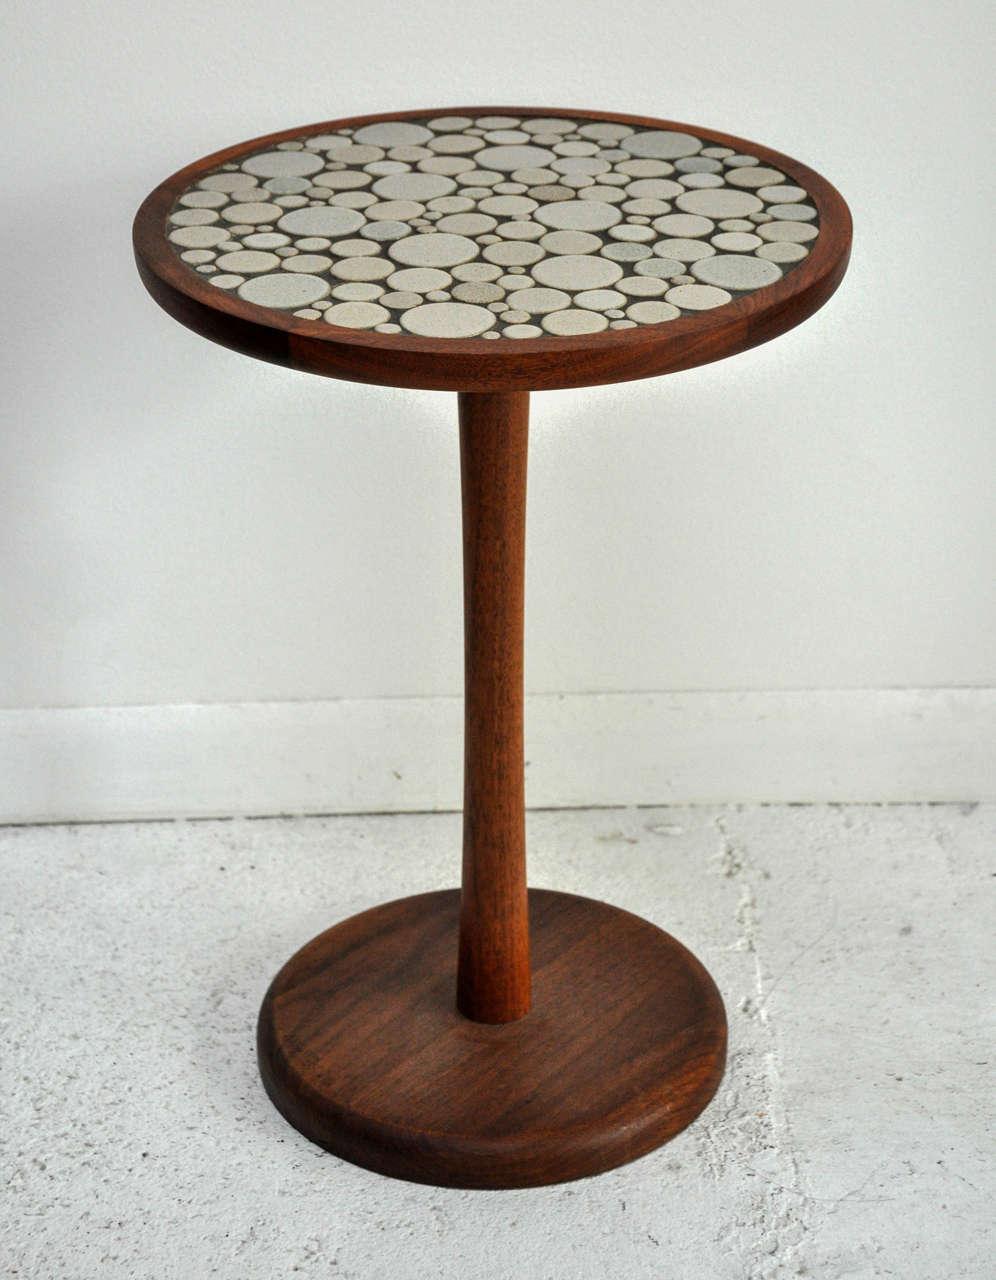 Ceramic tile top round side table by gordon martz at 1stdibs - Ceramic pedestal table base ...